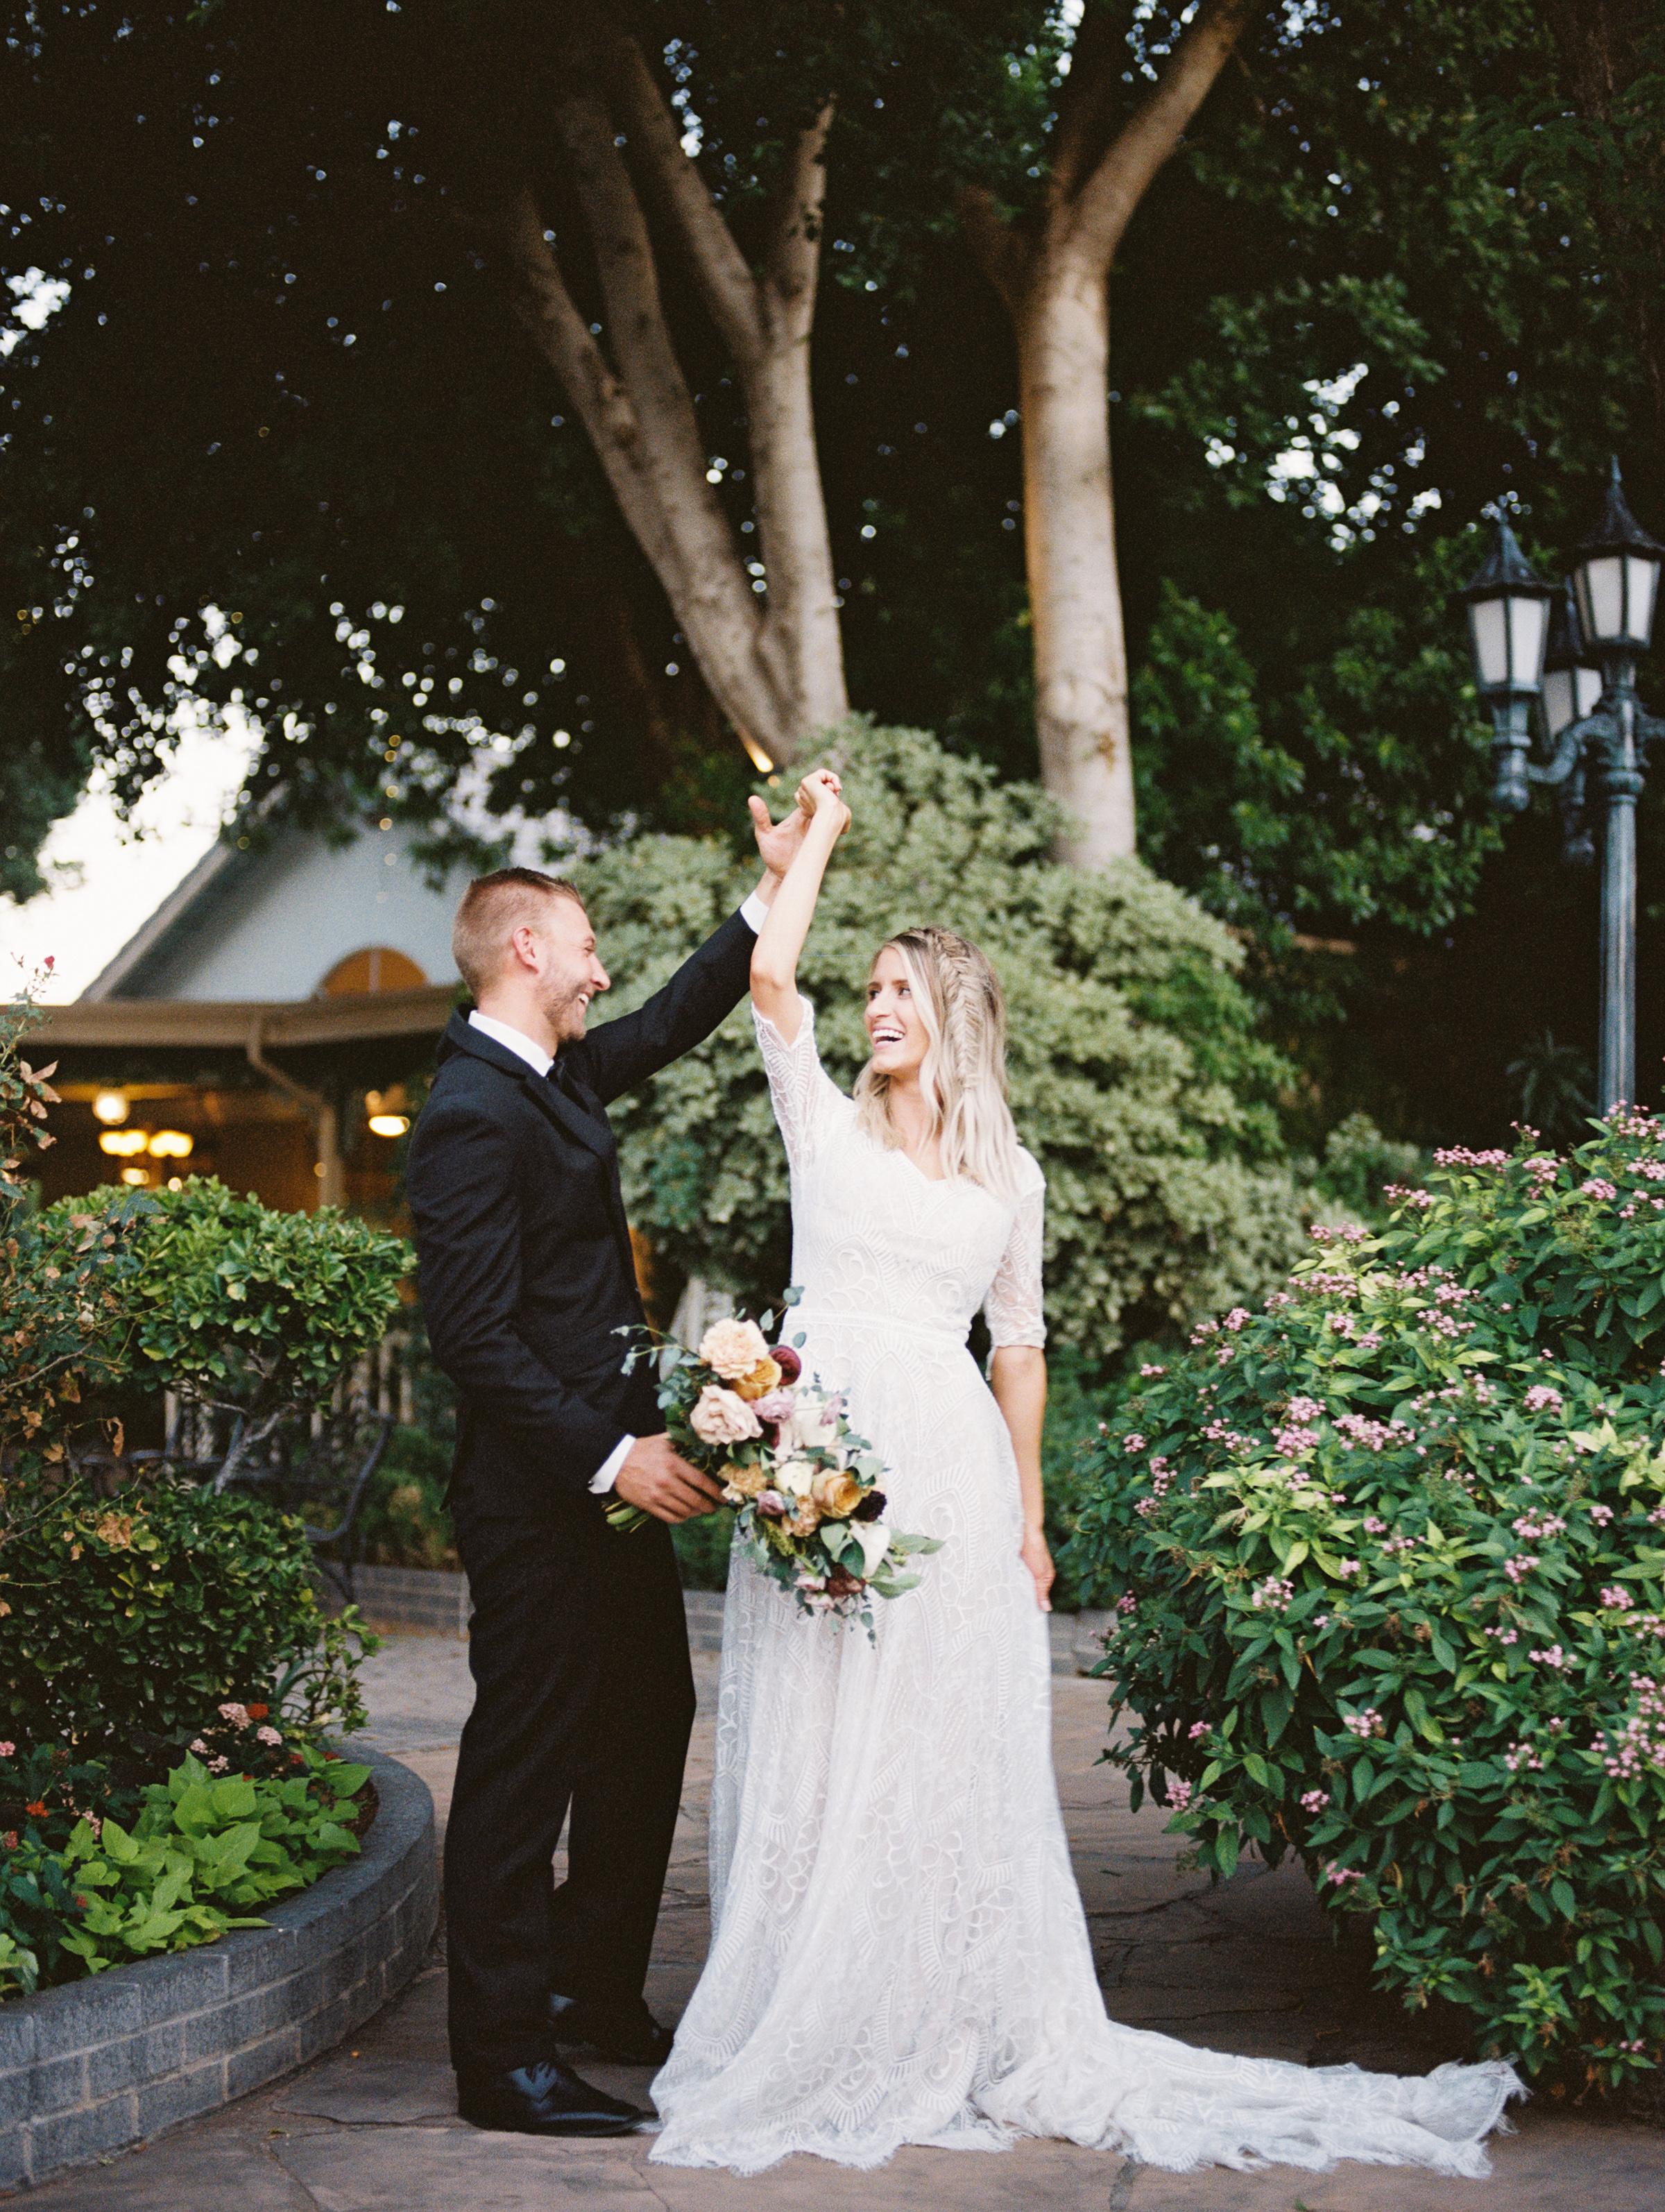 Boho Chic Long Sleeve Wedding Dress Fishtail Braid Wright House Truth And Beauty Photography 2